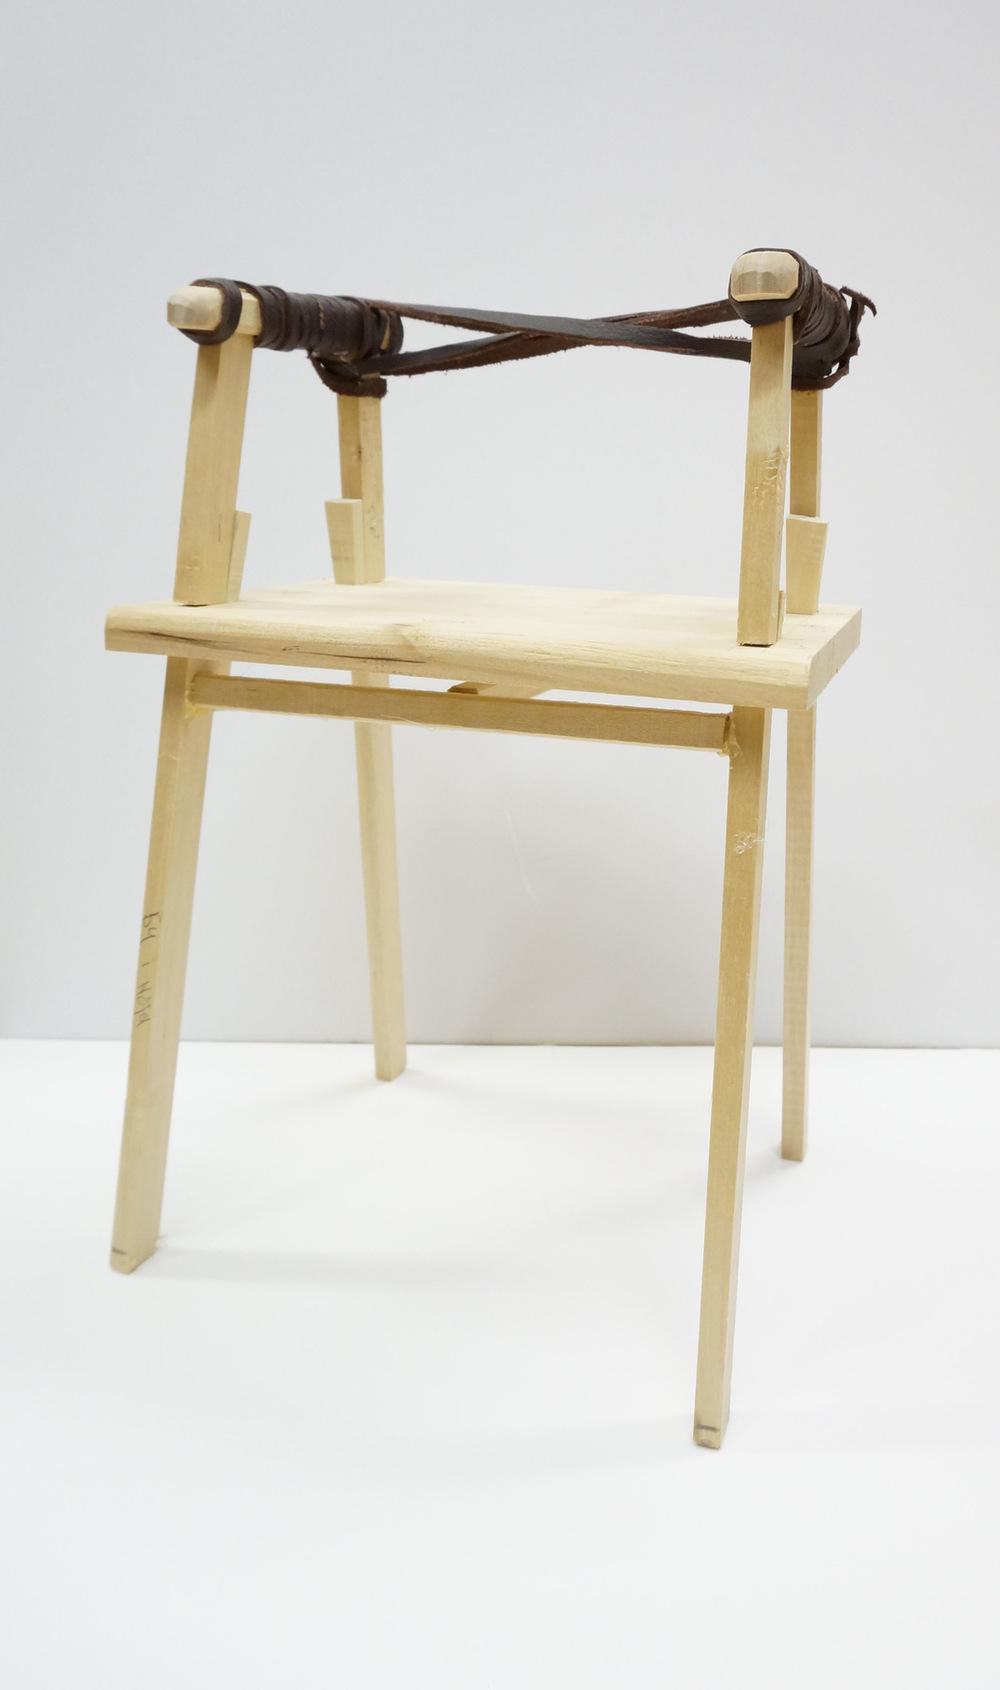 Dackelid Form - 1:5 scale model